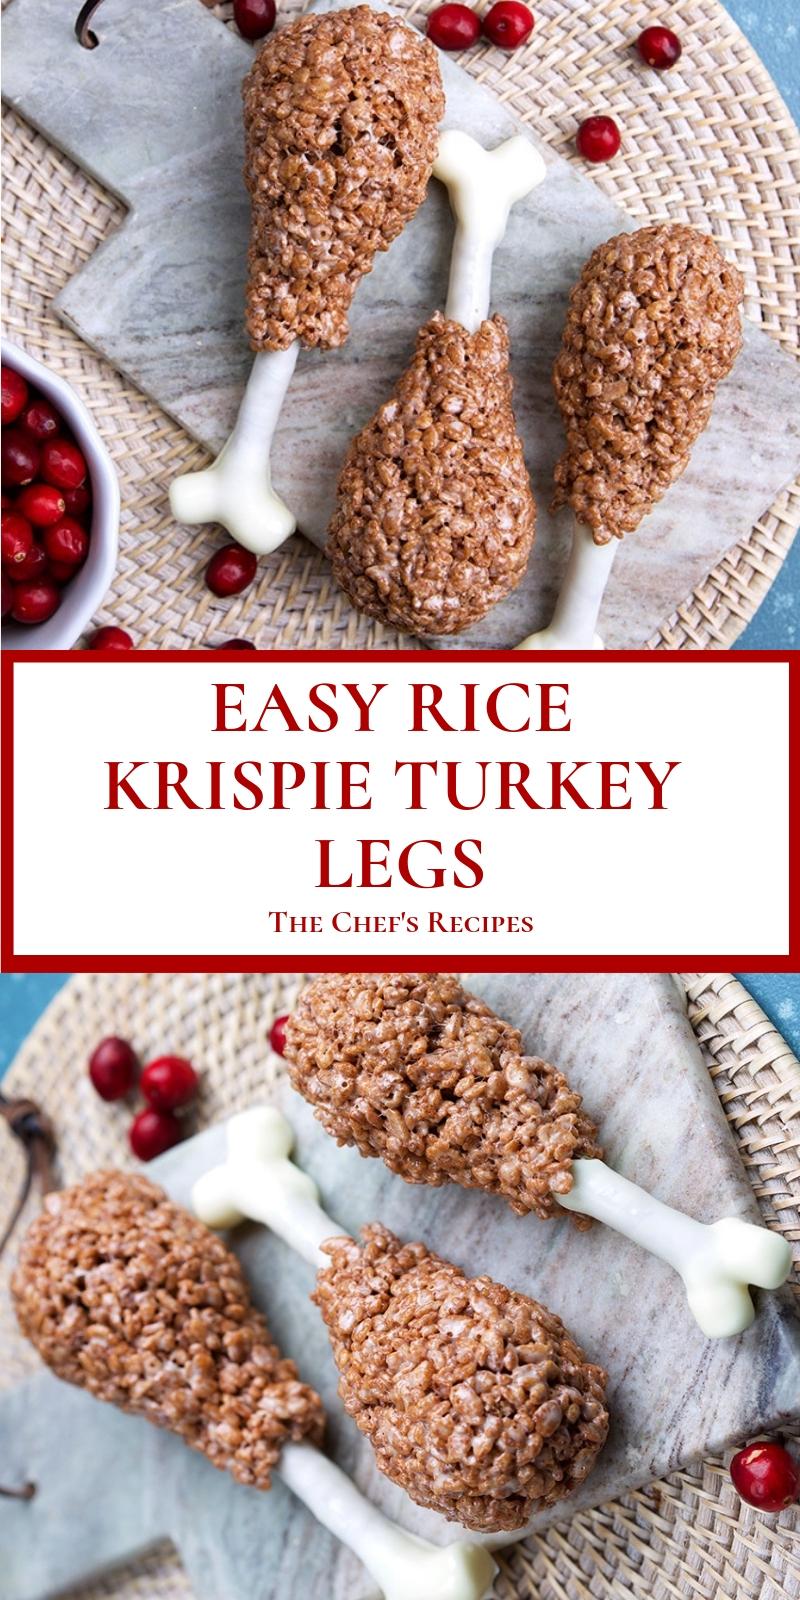 EASY RICE KRISPIE TURKEY LEGS